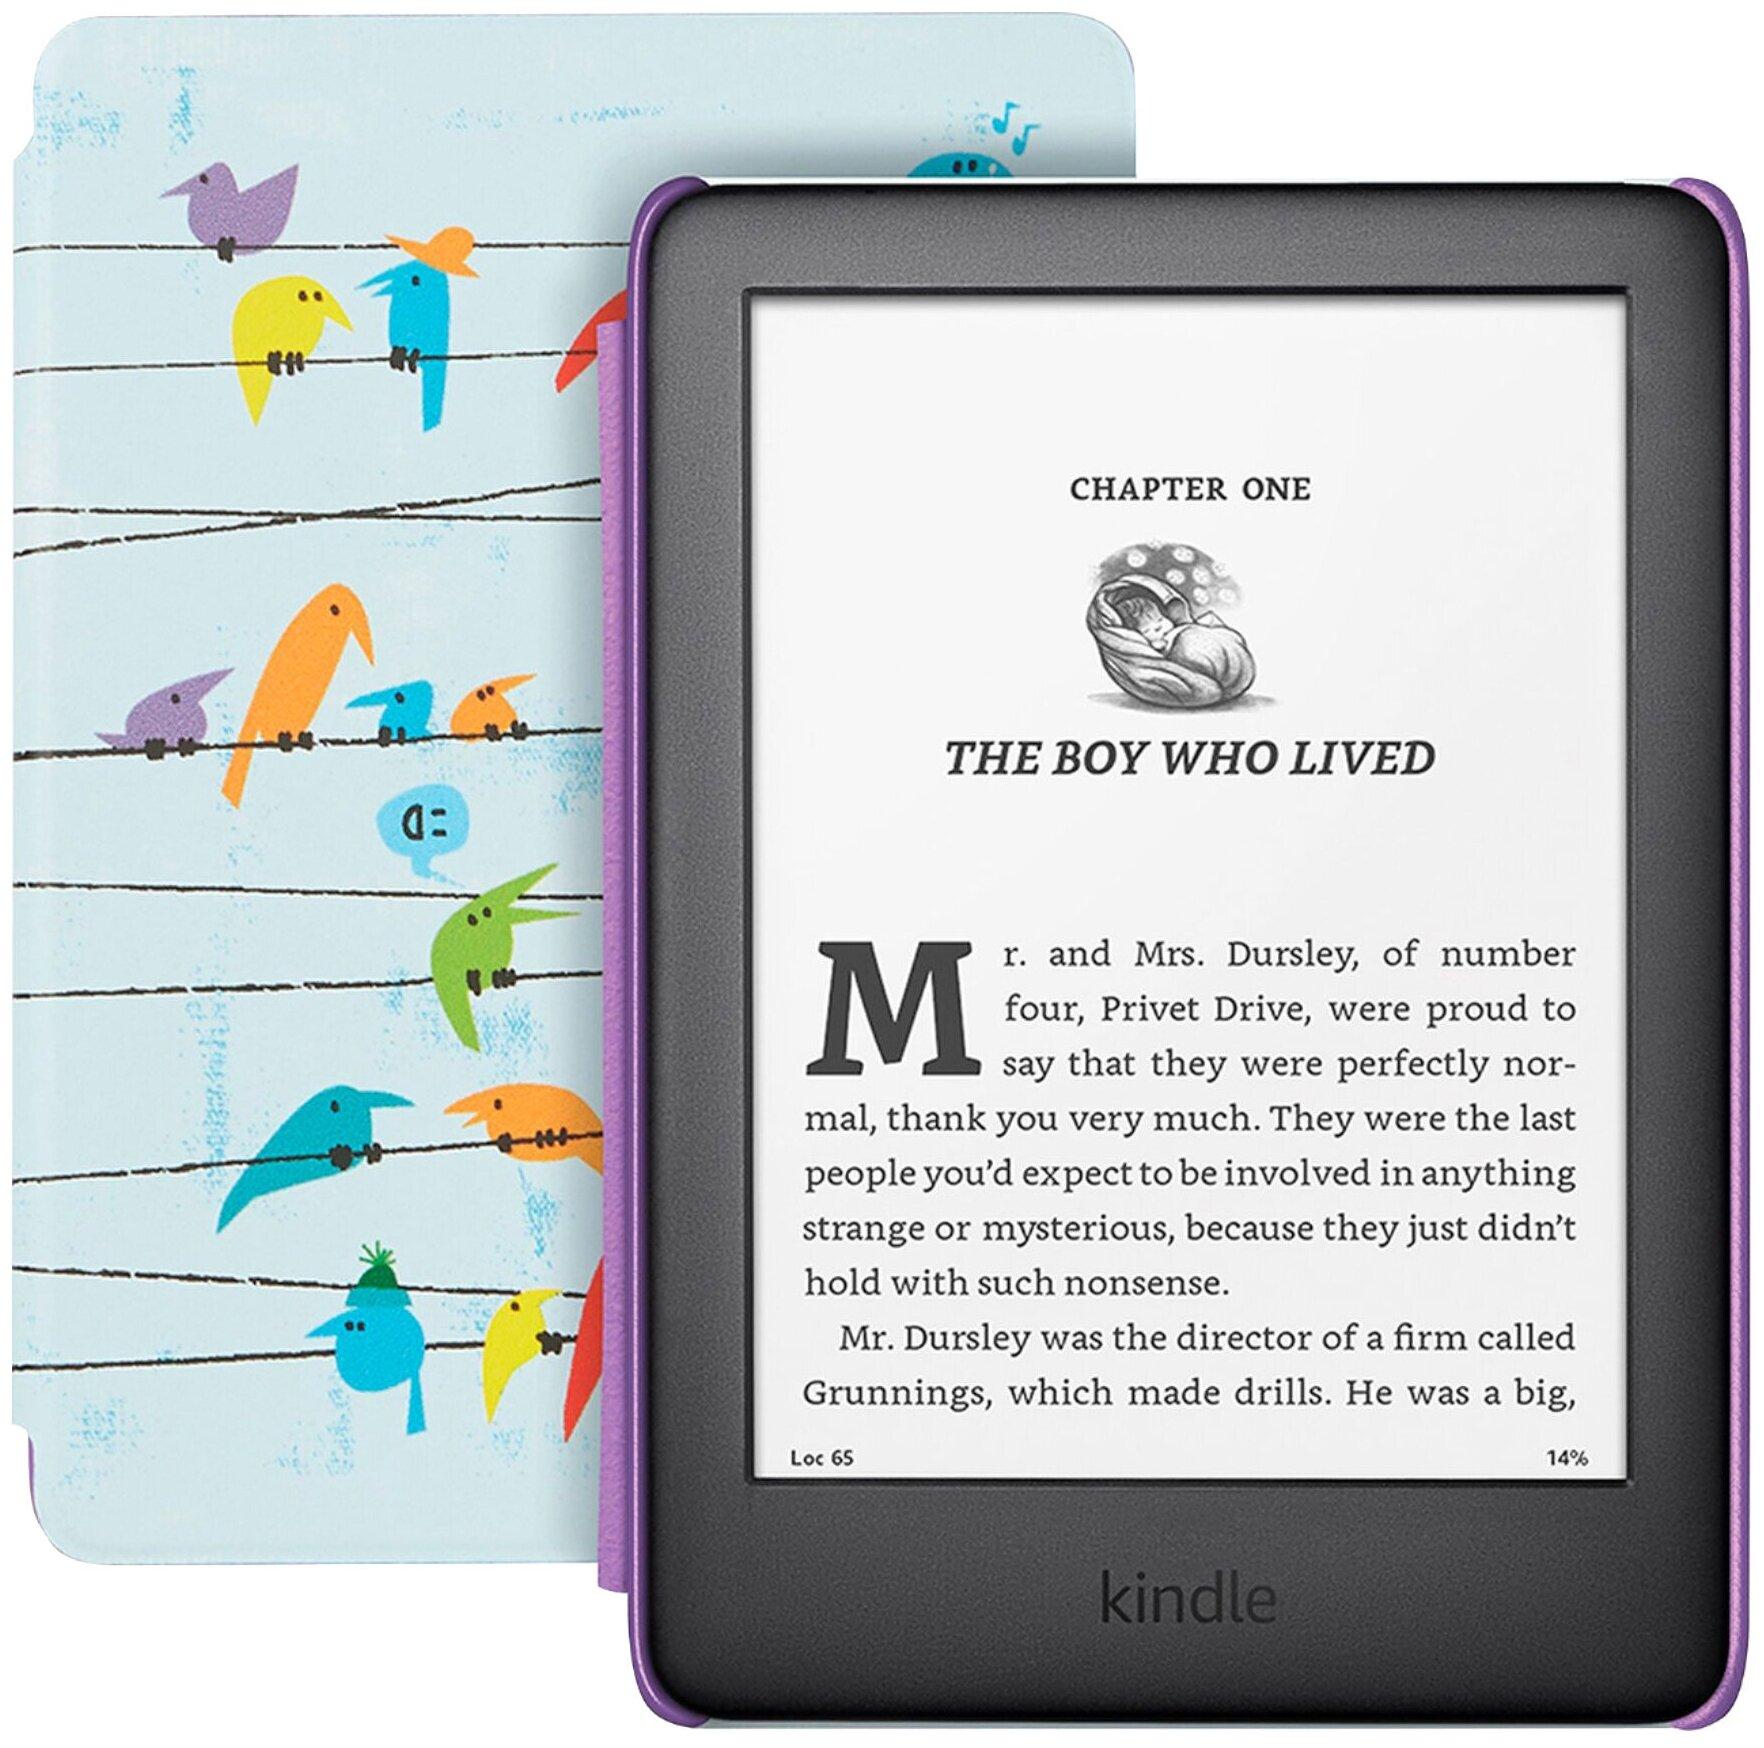 Elektronnaya Kniga Amazon Kindle 2019 Kids Edition 8 Gb